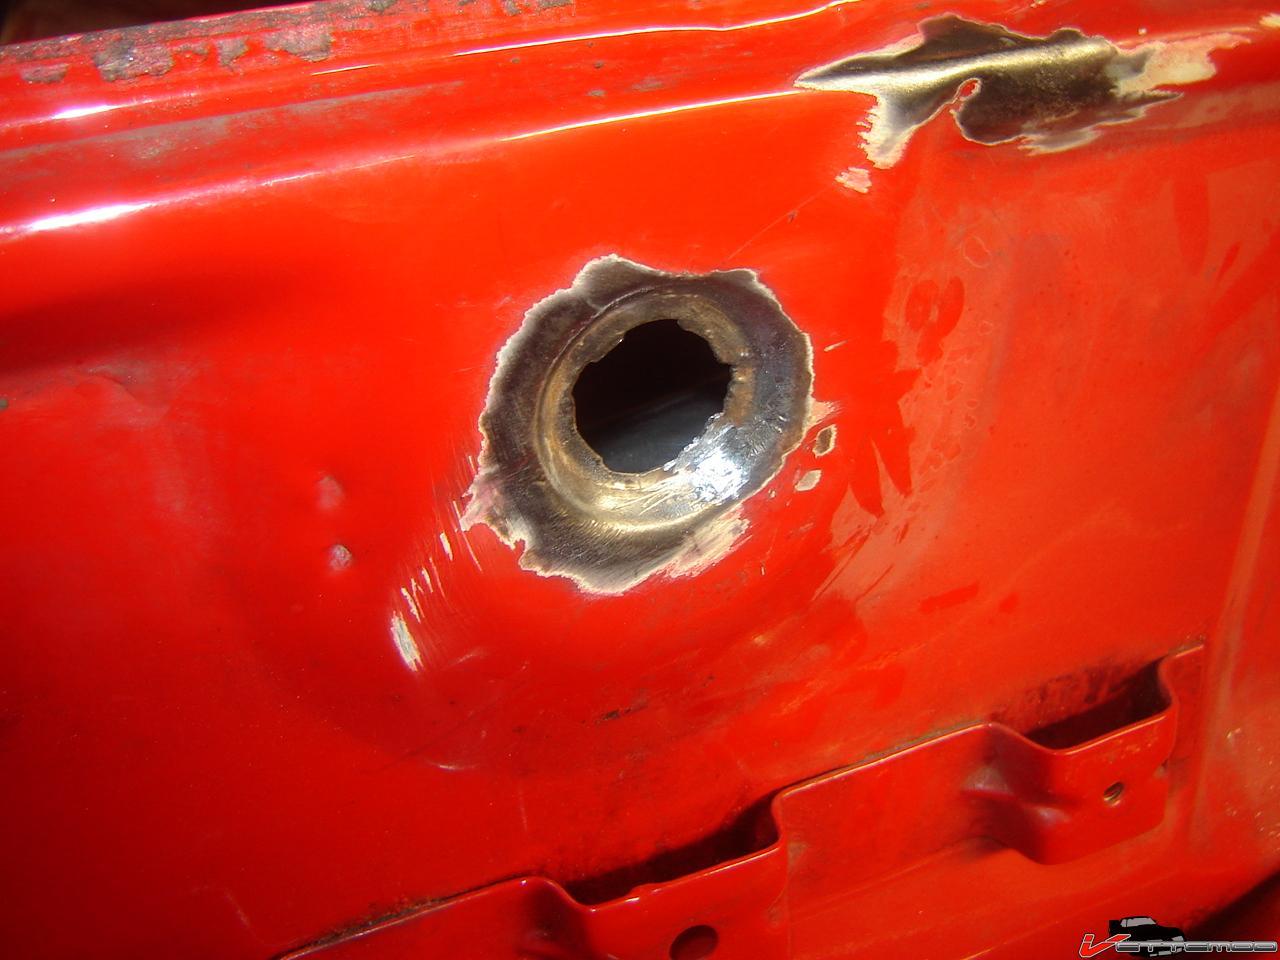 how to fix rust spot bottom of pebblecrtete pool